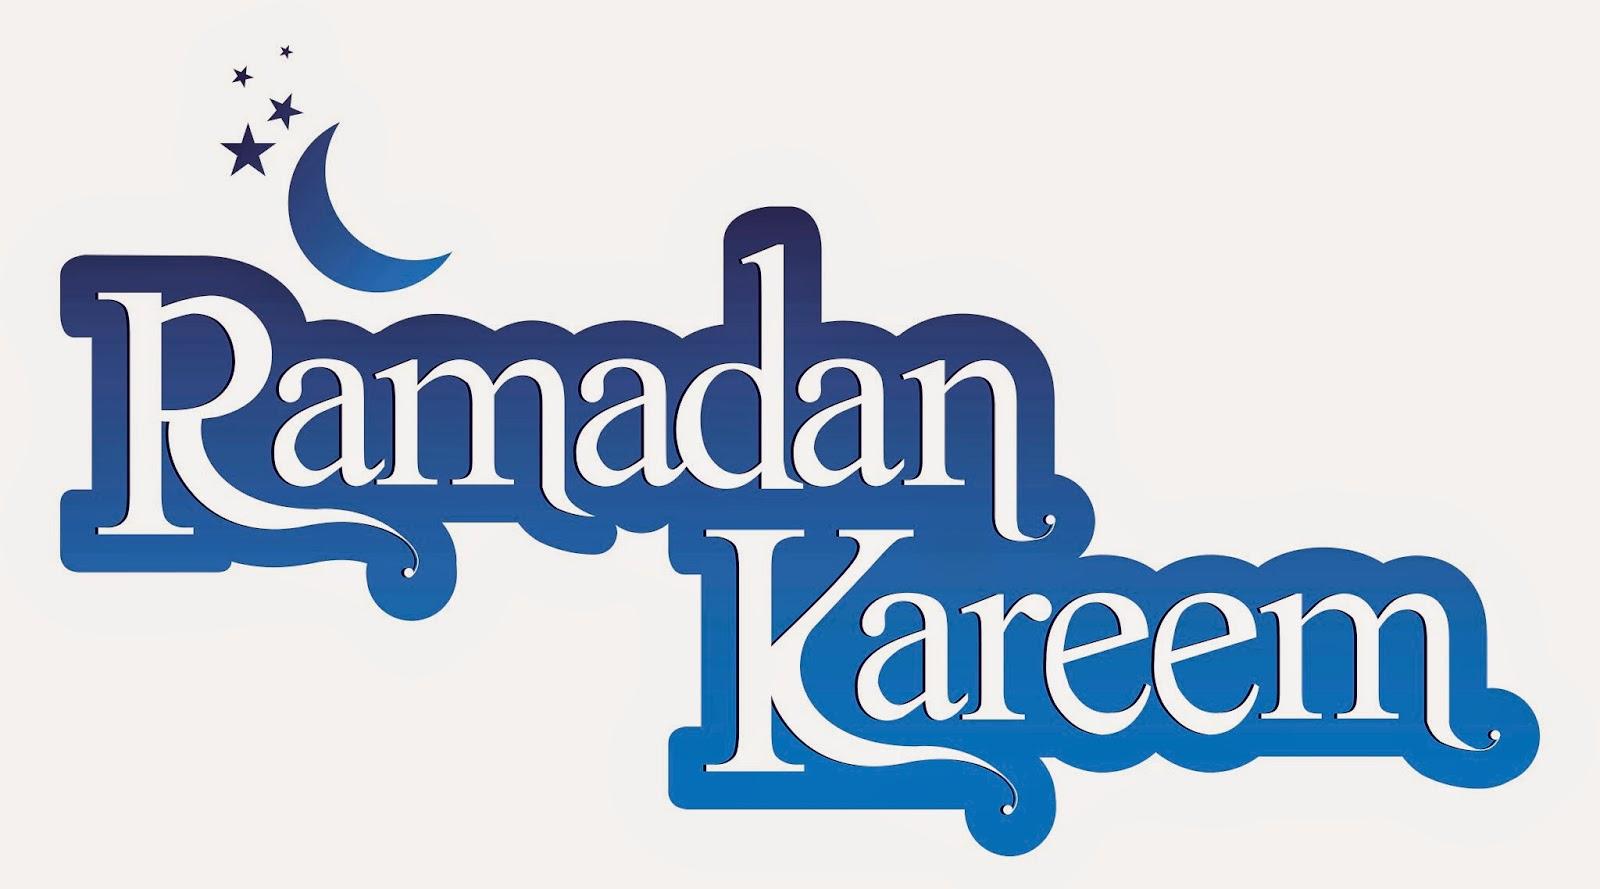 Beautiful blue art of happy ramadan night english word